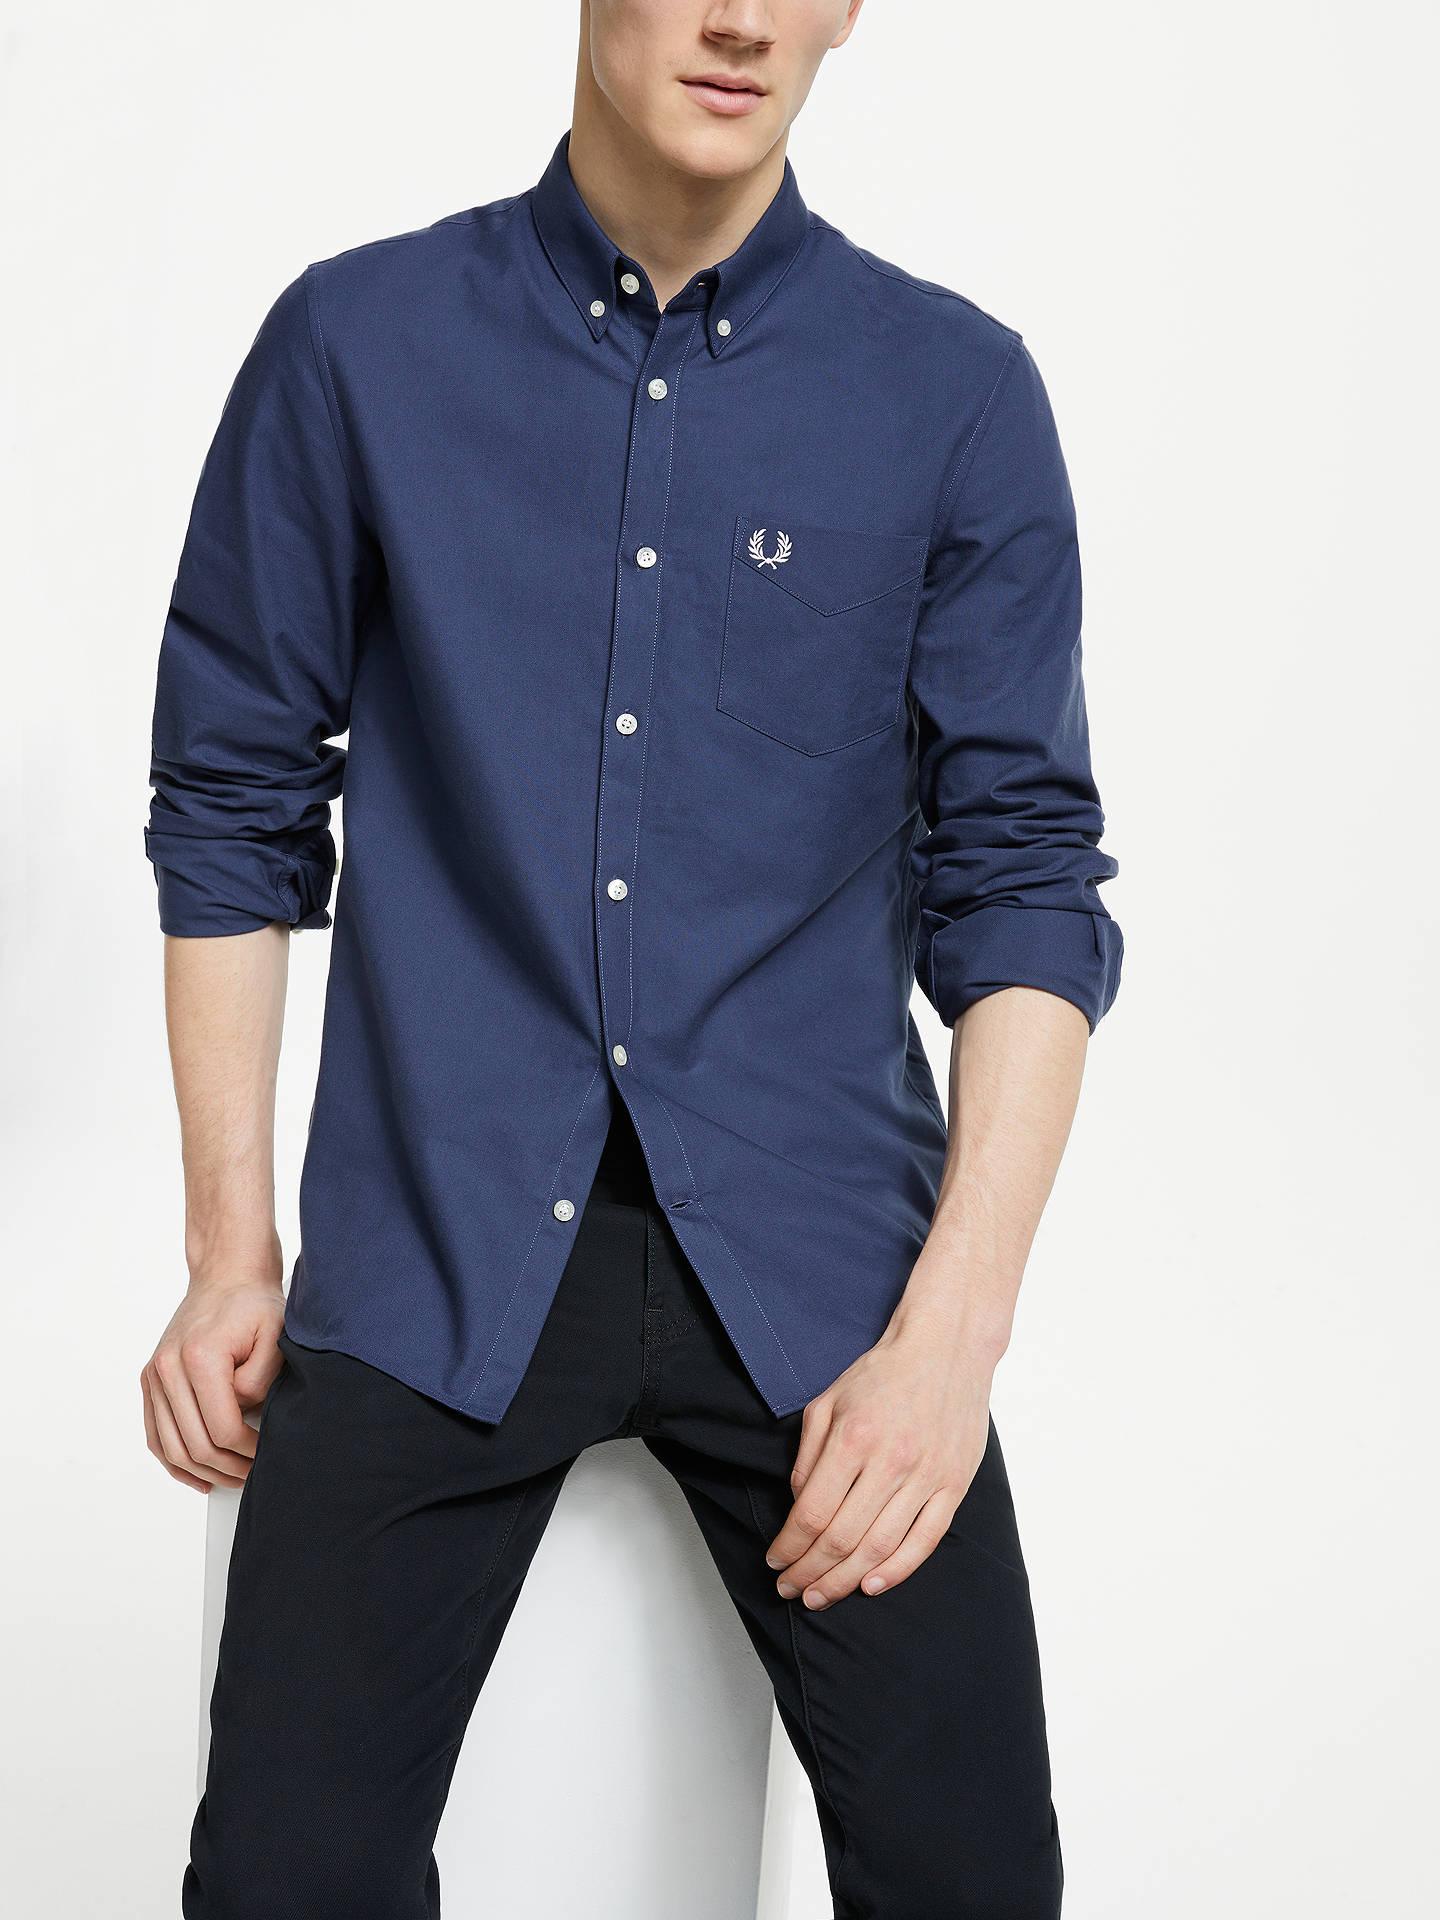 3ba1e8b4 Buy Fred Perry Classic Oxford Long Sleeve Shirt, Phantom, M Online at  johnlewis.